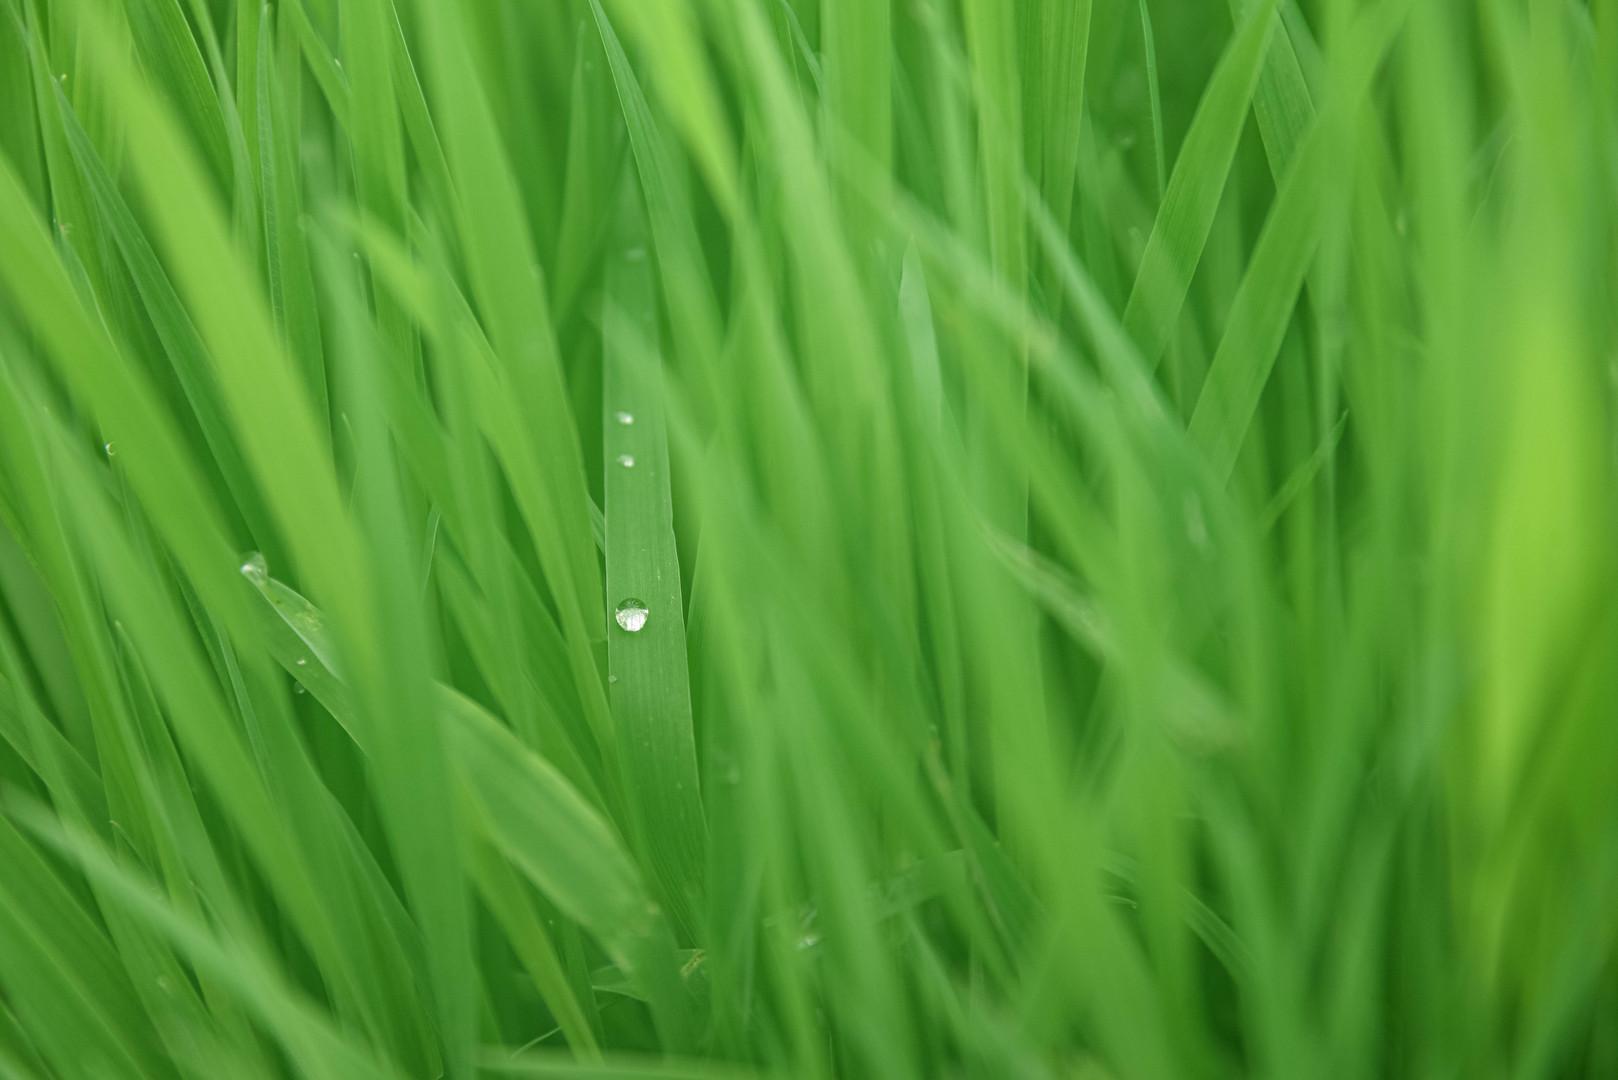 A drop in Nature